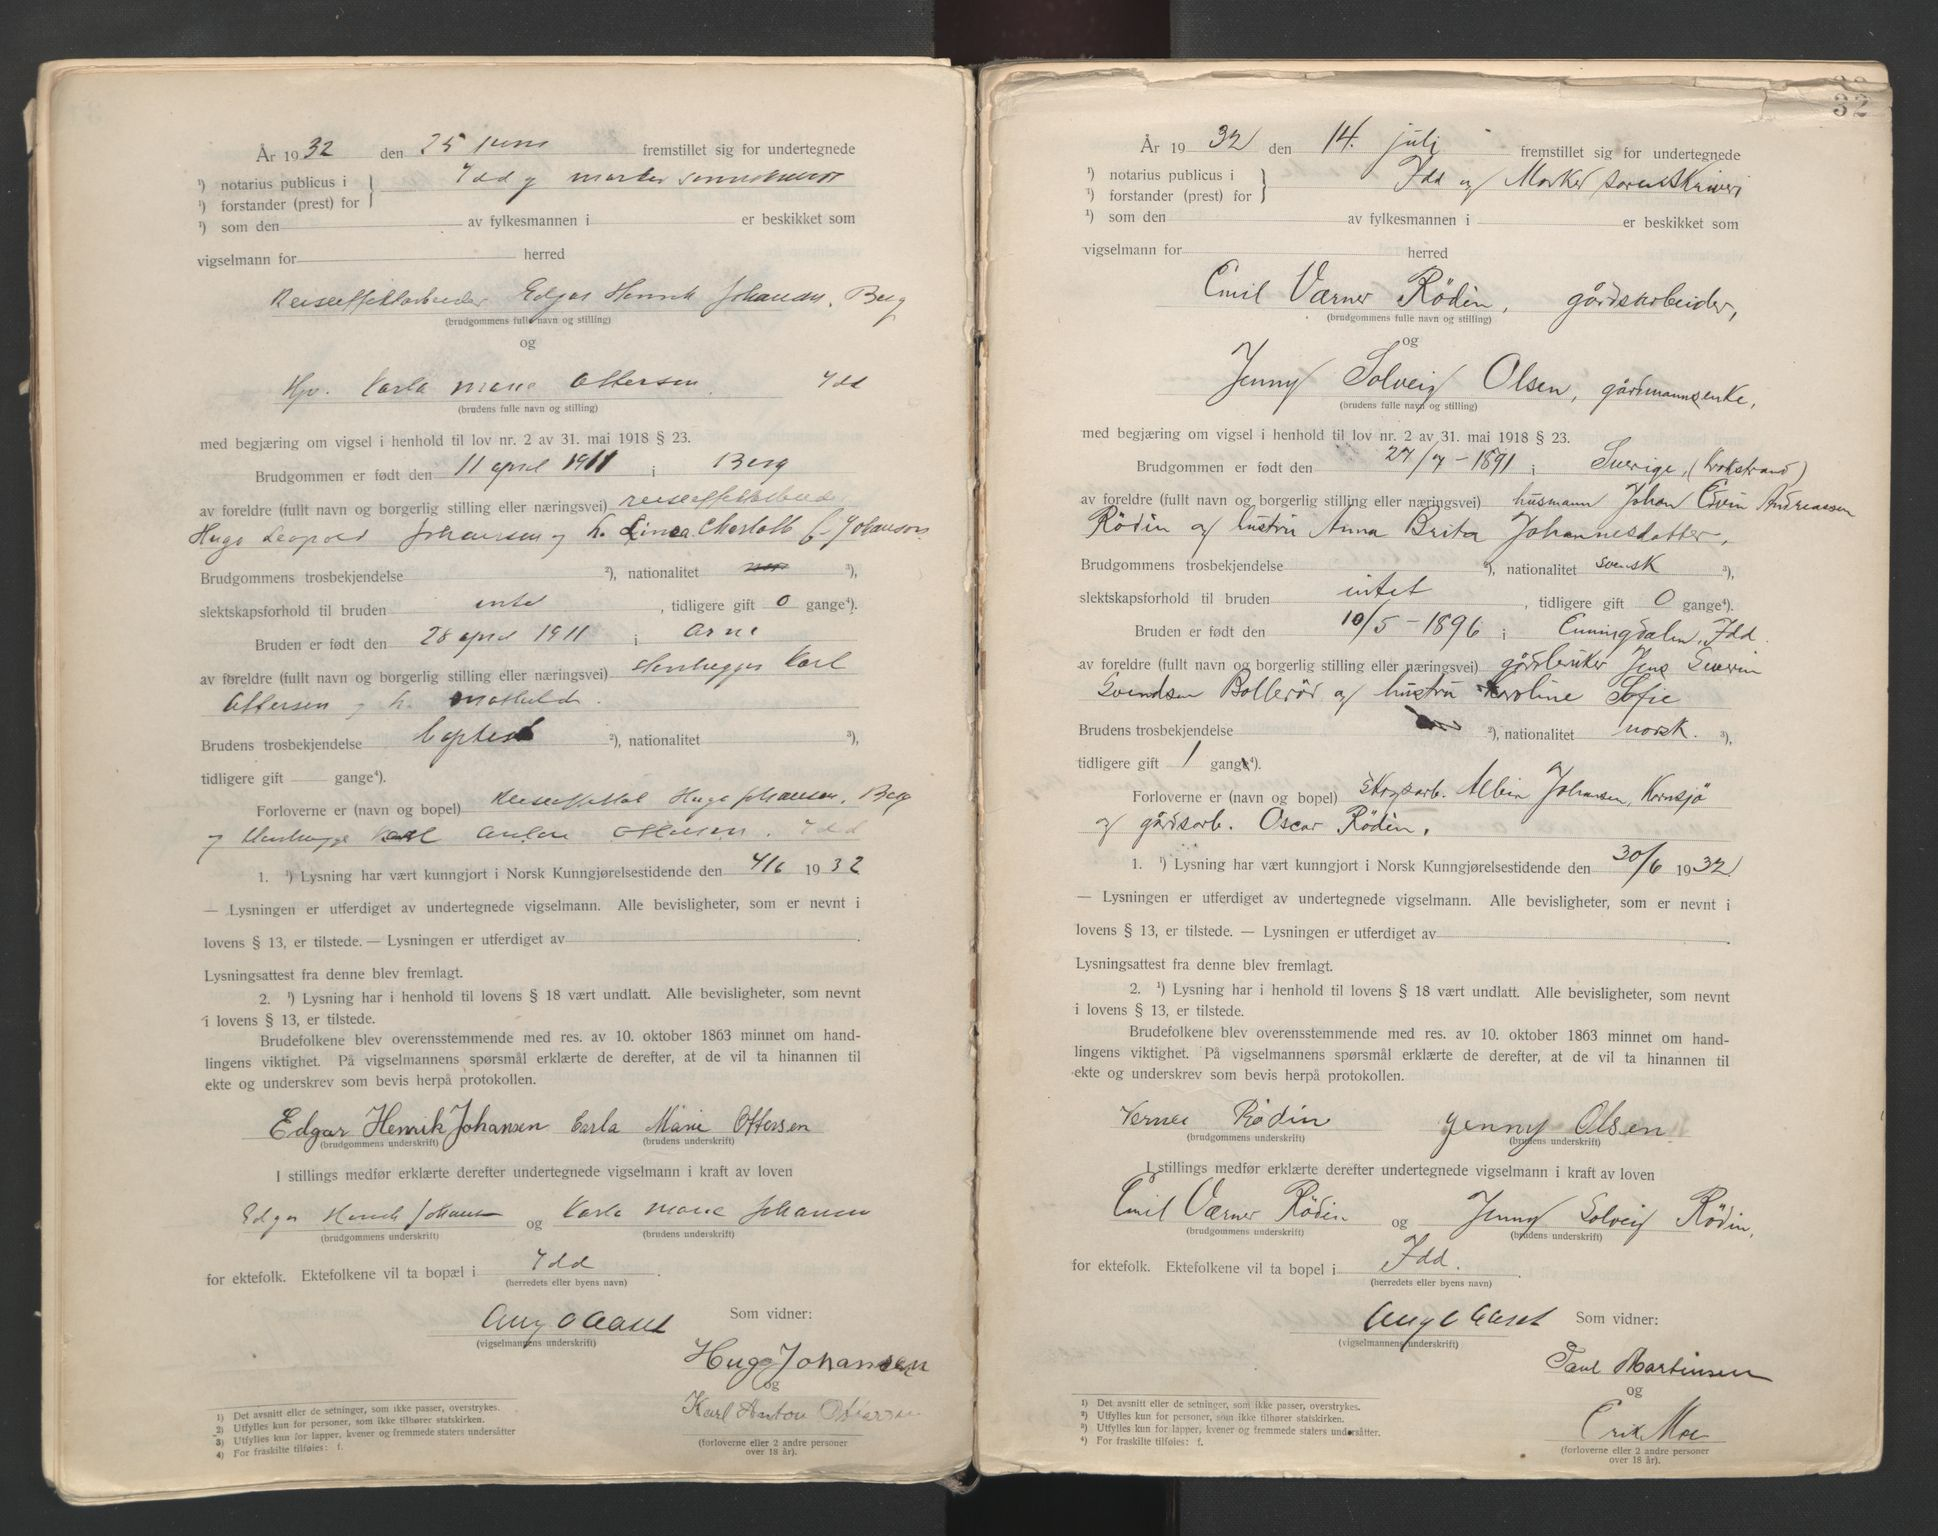 SAO, Idd og Marker sorenskriveri, L/Lc/L0001: Vigselsbøker, 1920-1942, s. 32